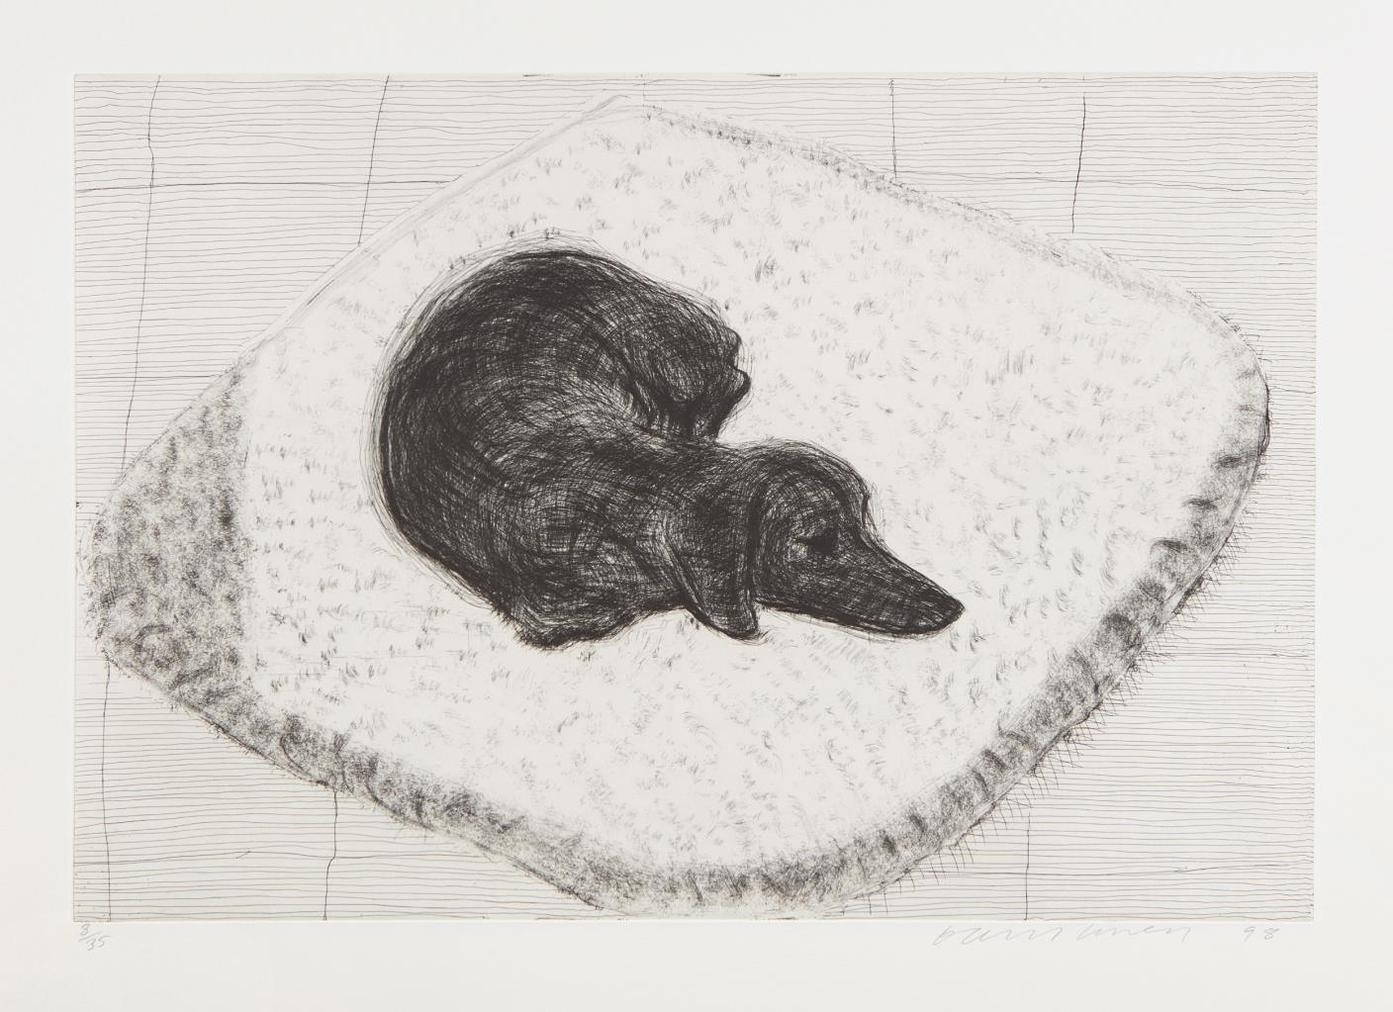 David Hockney-Dog Etching No. 12, From Dog Wall-1998